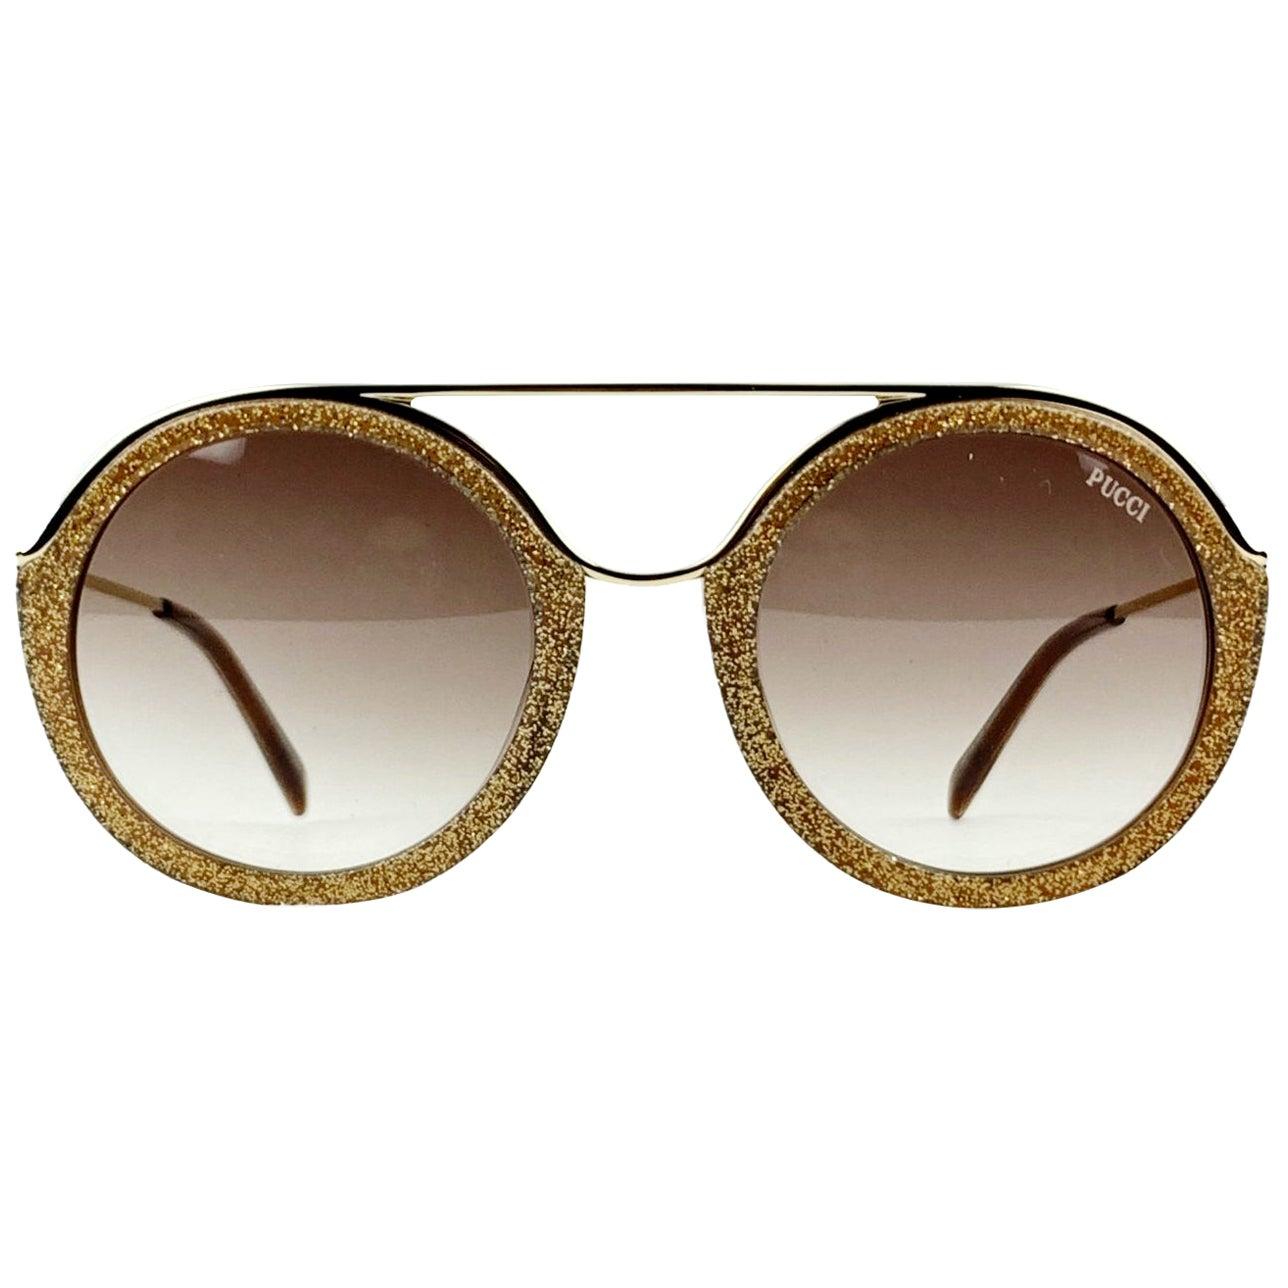 Emilio Pucci Gold Round Glitter EP 13 Sunglassses 52/22 135 mm Mint